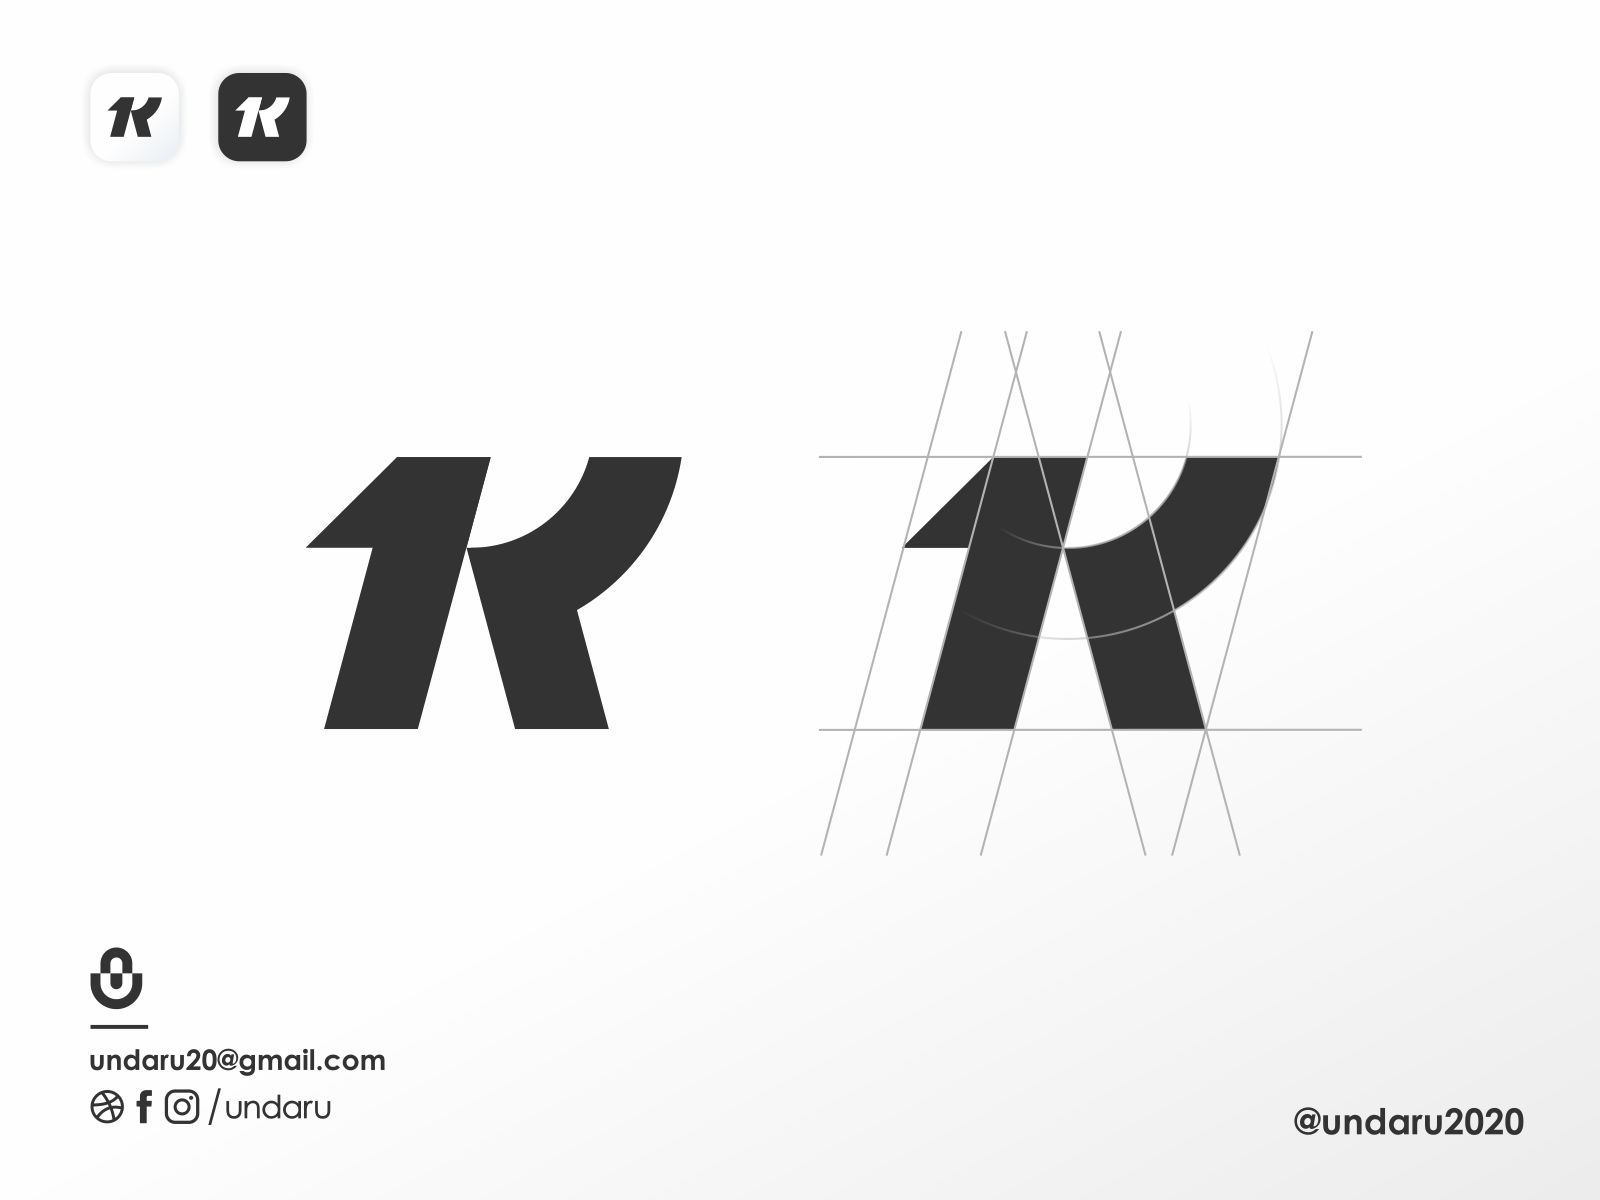 1theK logo 1 logo illustrator illustration app simple logo monogram logo icon flat branding app icon